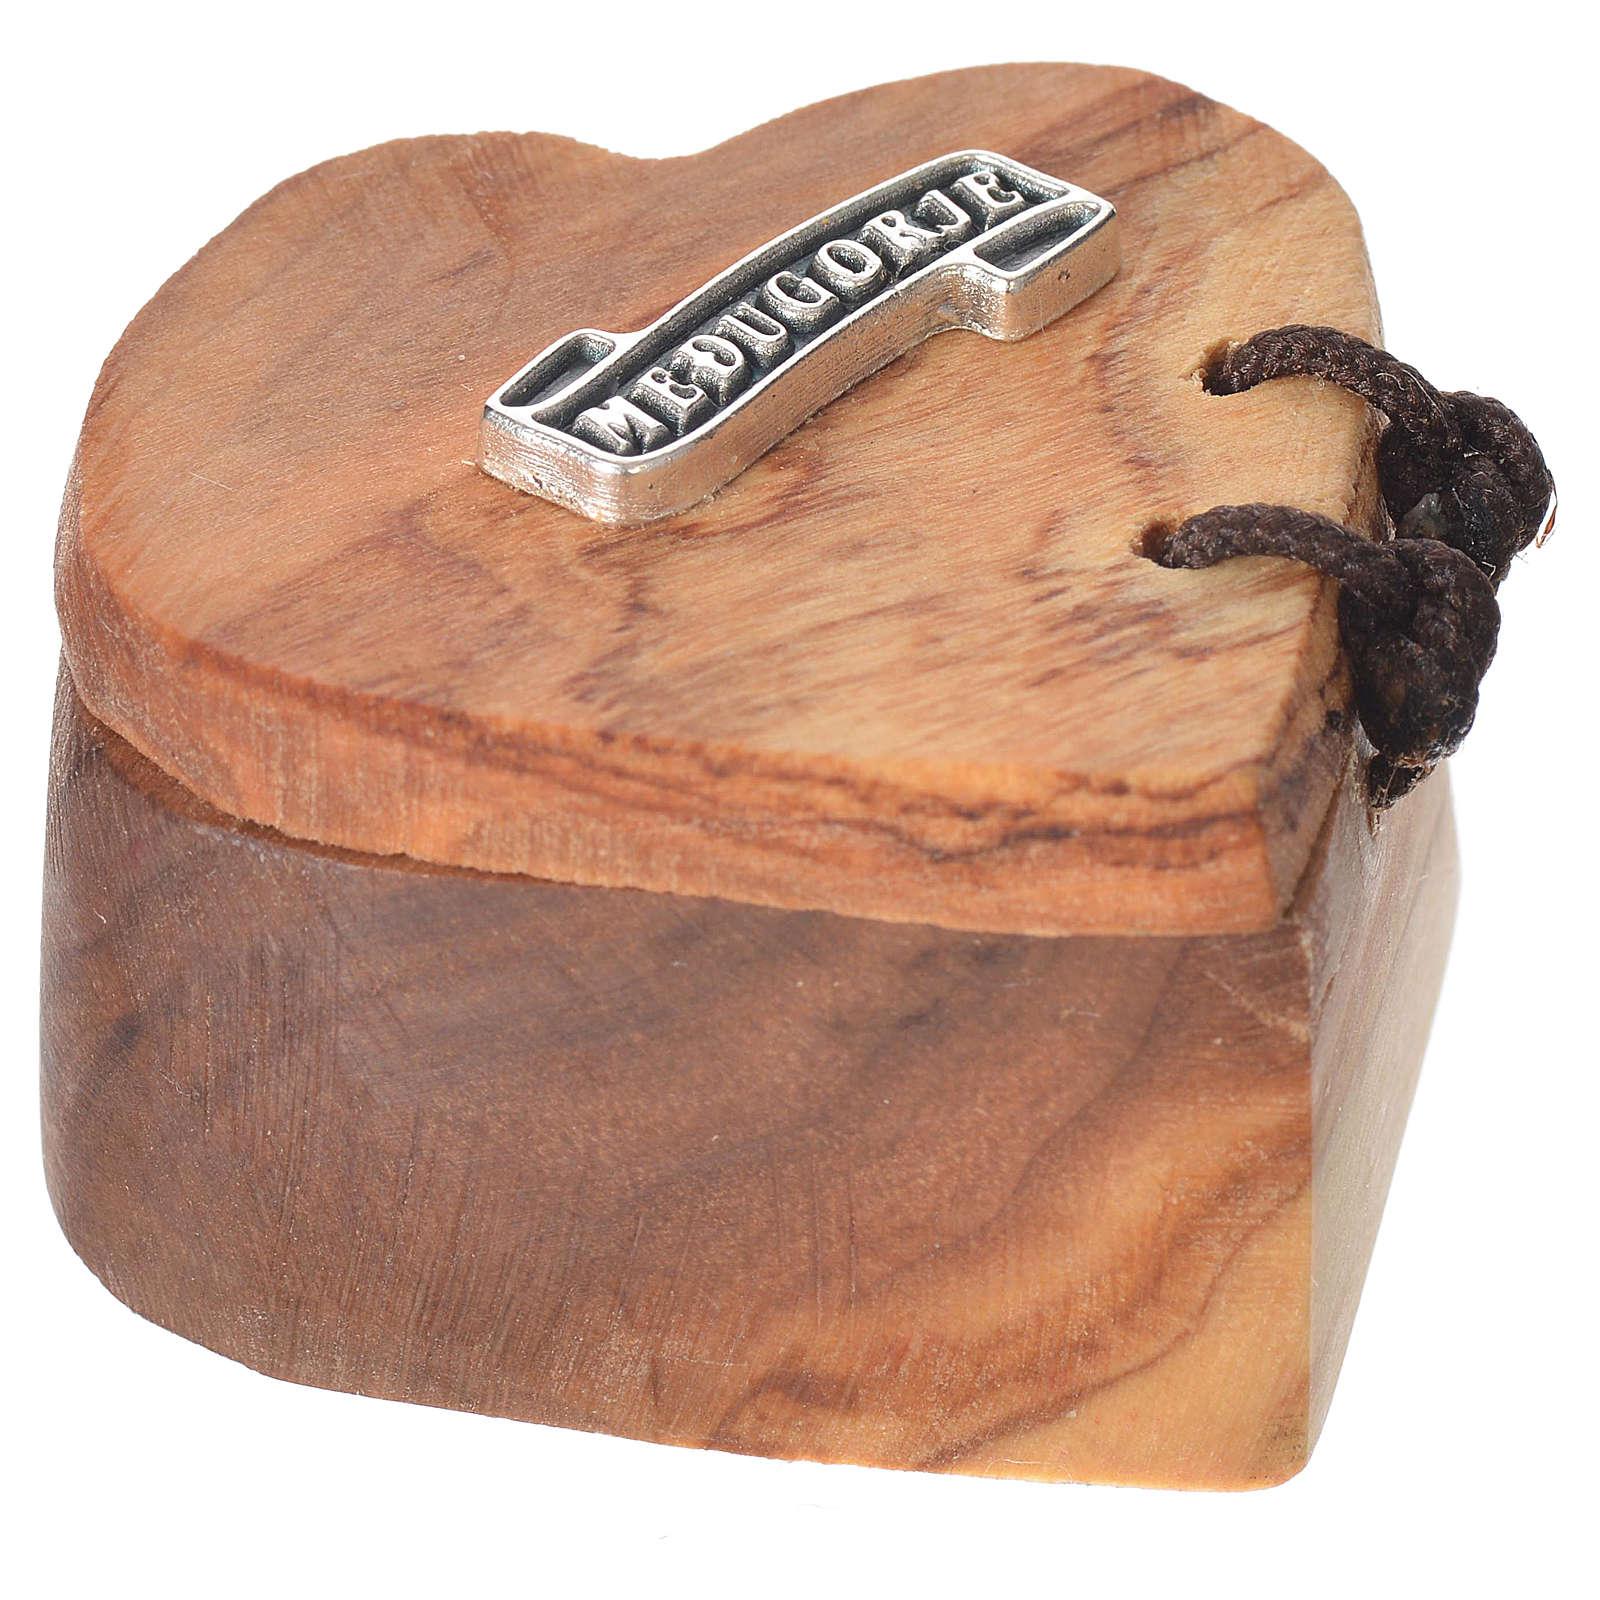 Portarosario Medjugorje ulivo cuore 4